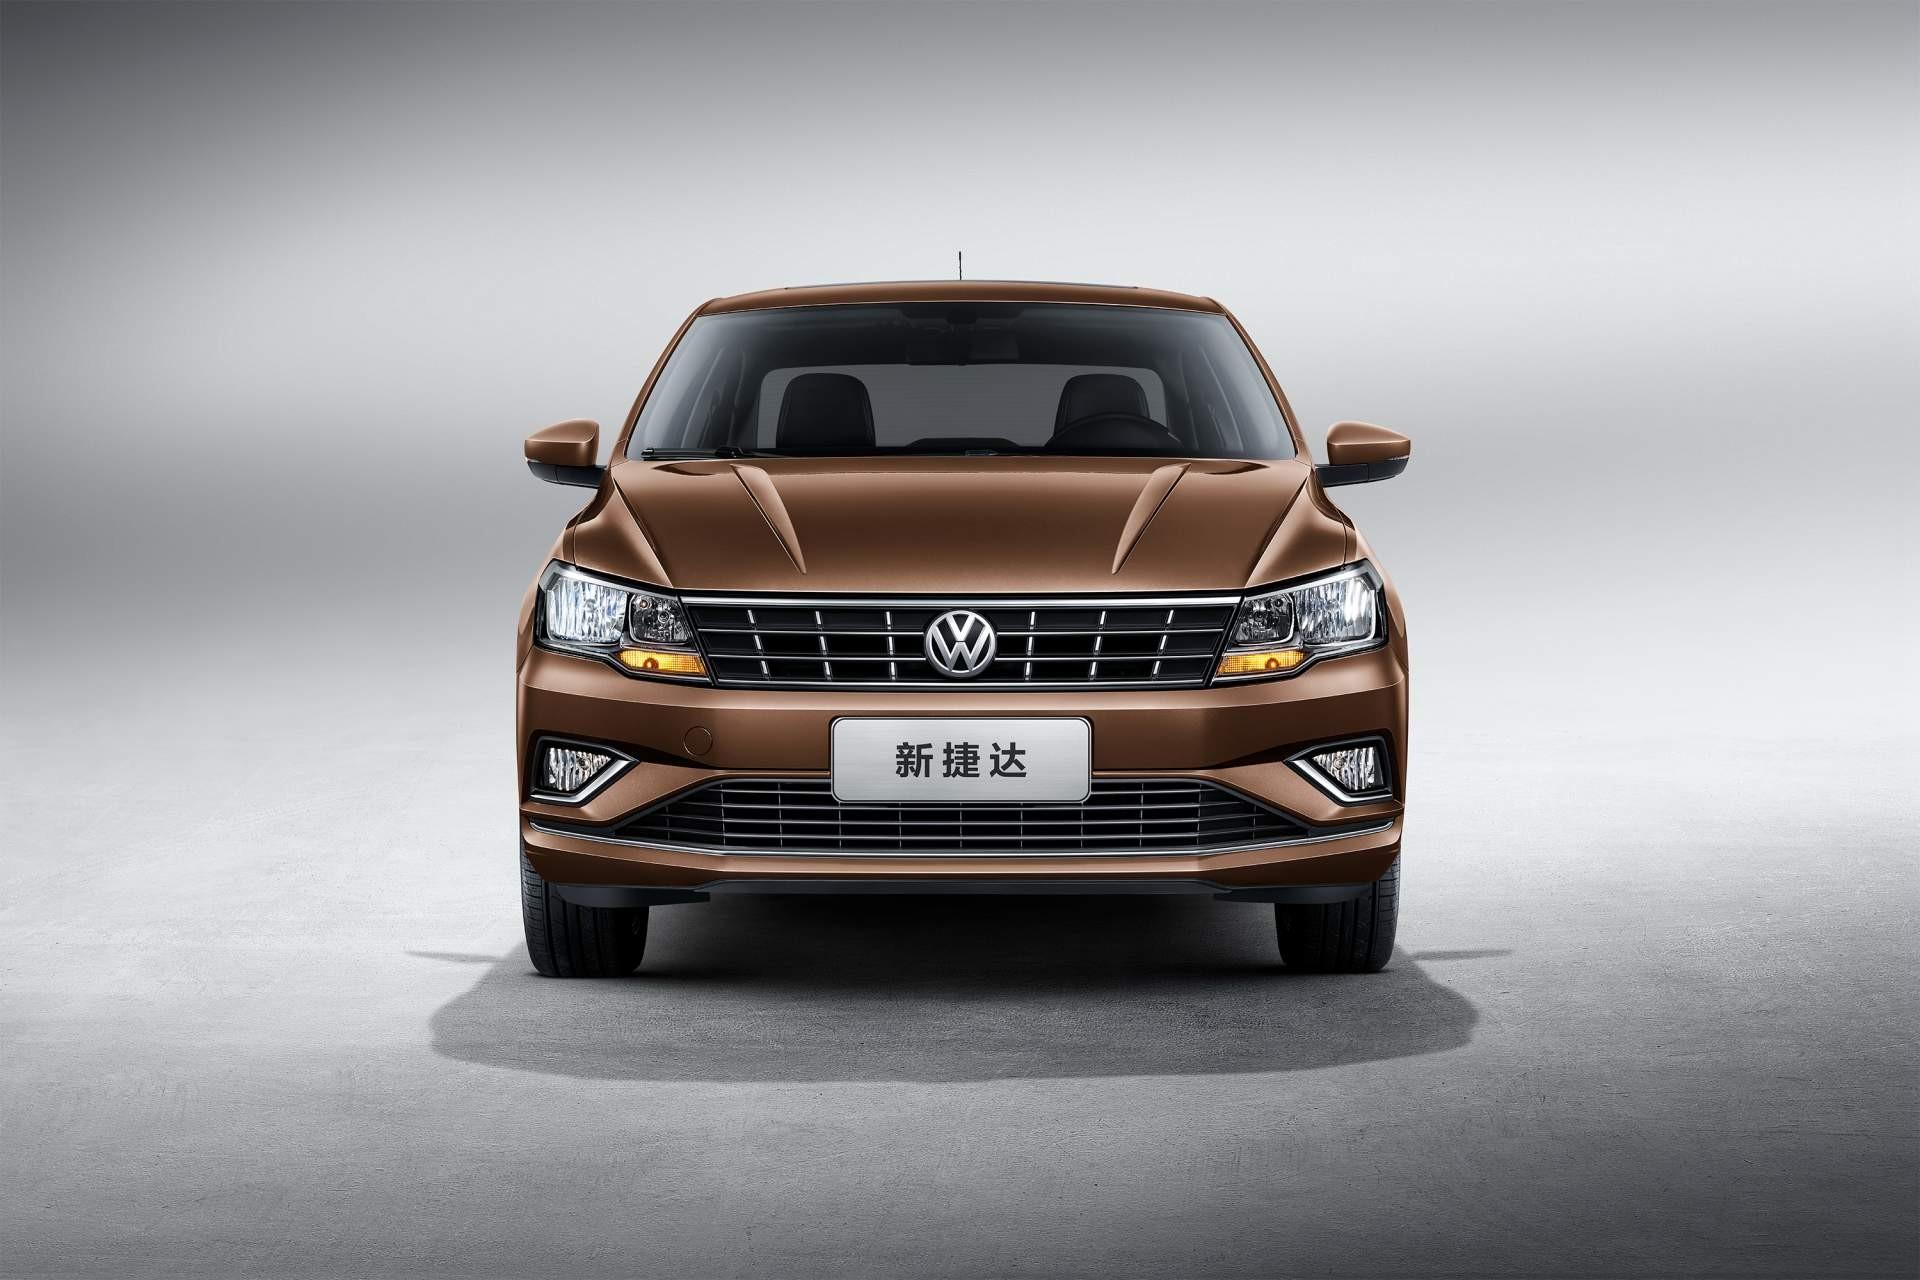 Jetta станет бюджетным брендом VW в Китае 1